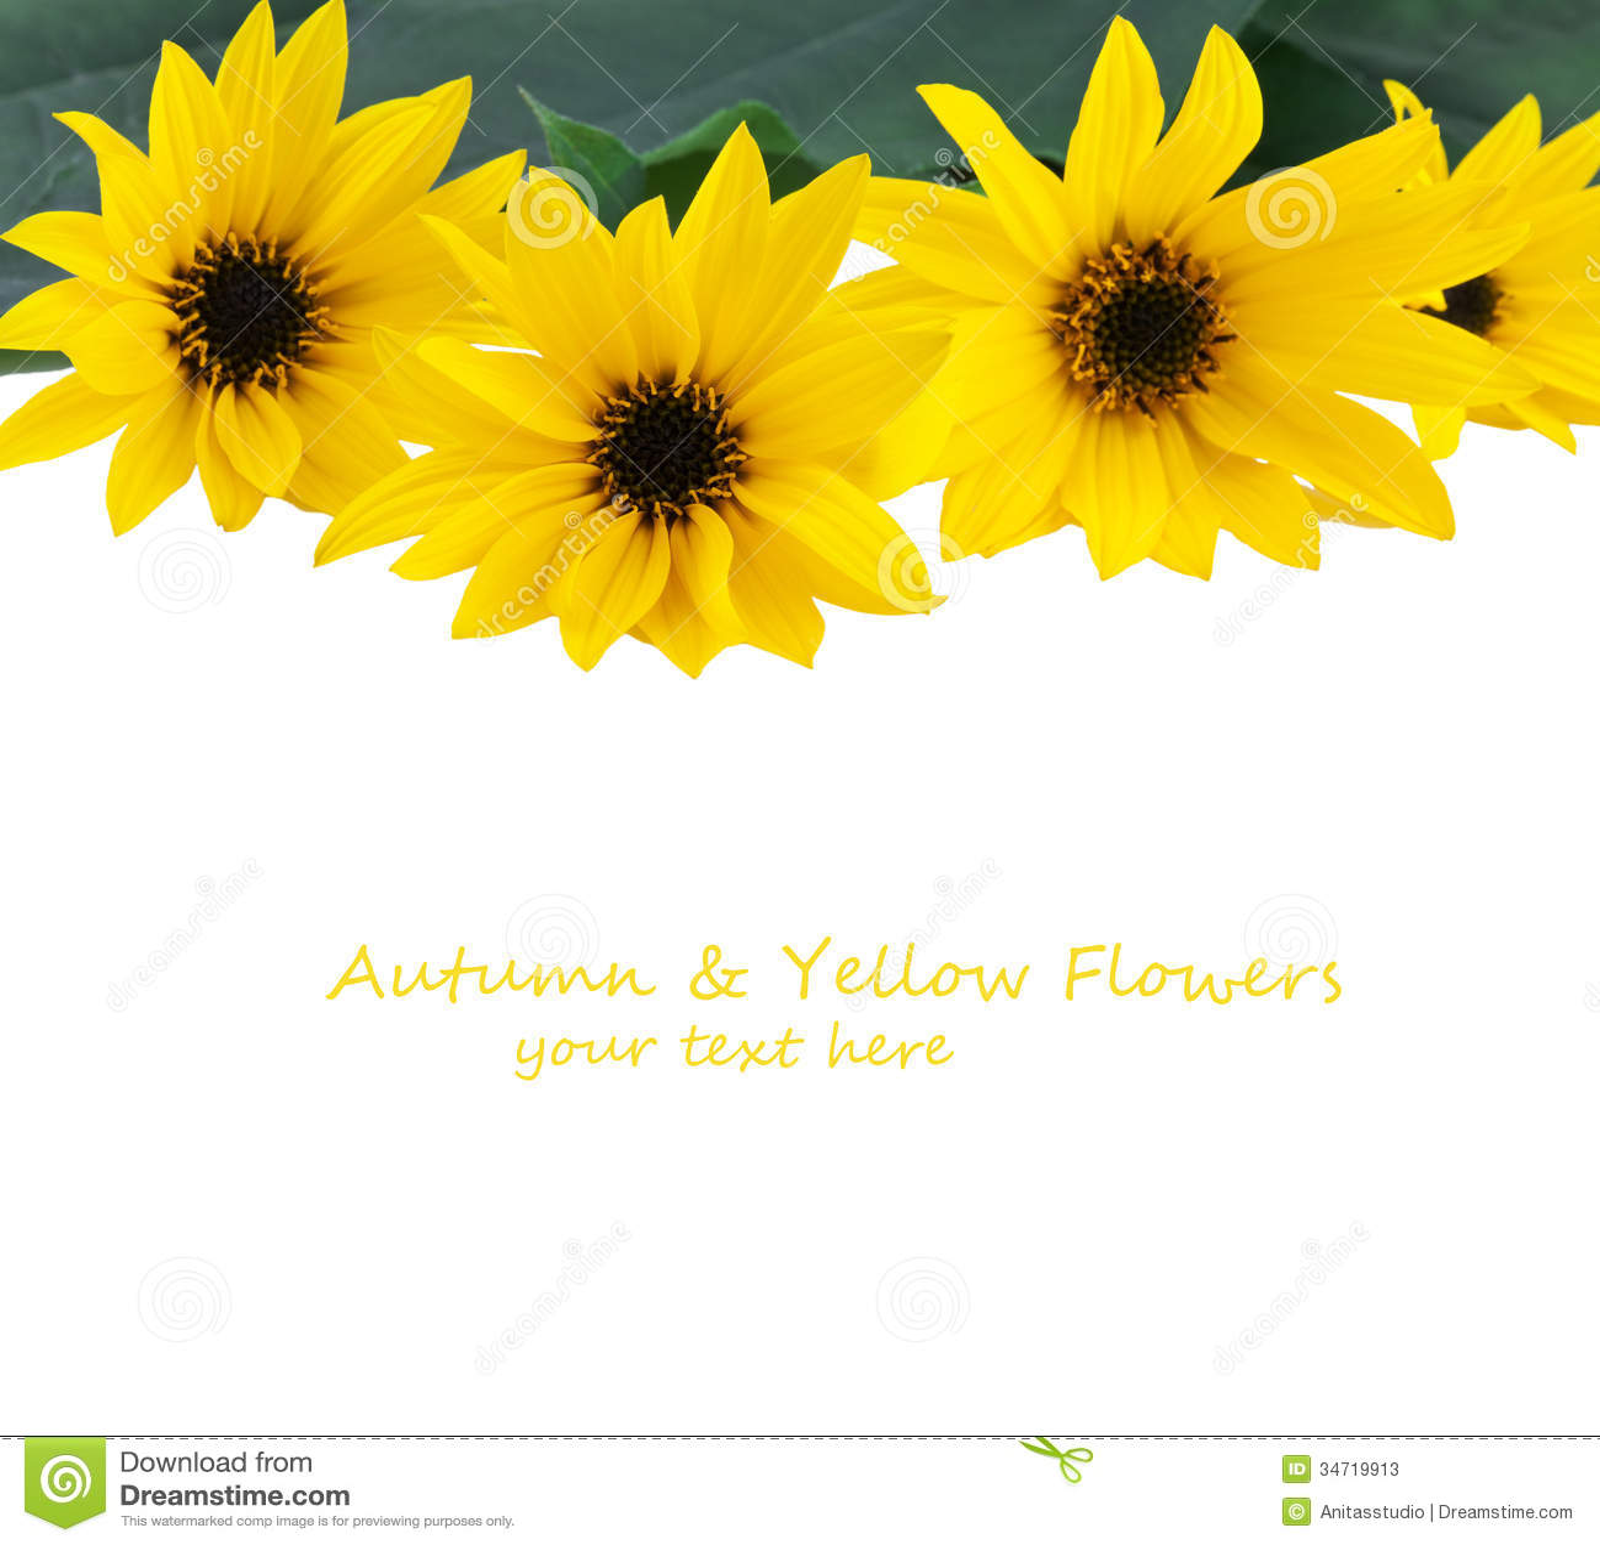 Yellow Flowers Border Stock Photos - Image: 34719913